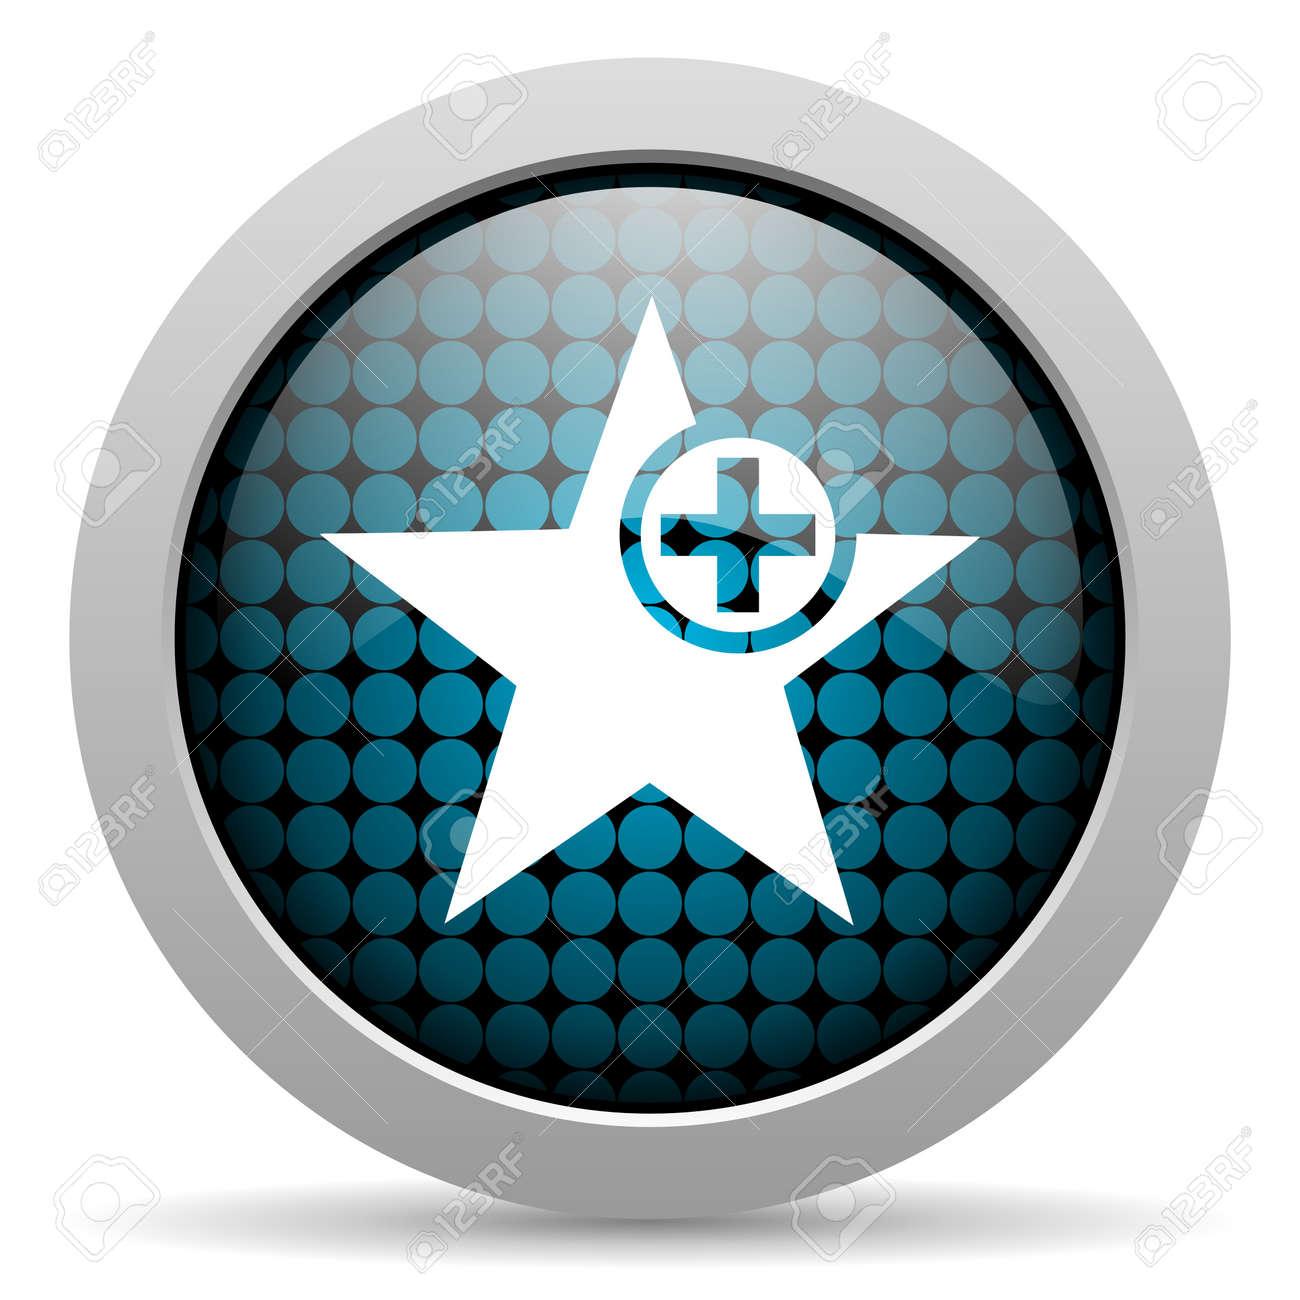 star glossy icon Stock Photo - 19512532